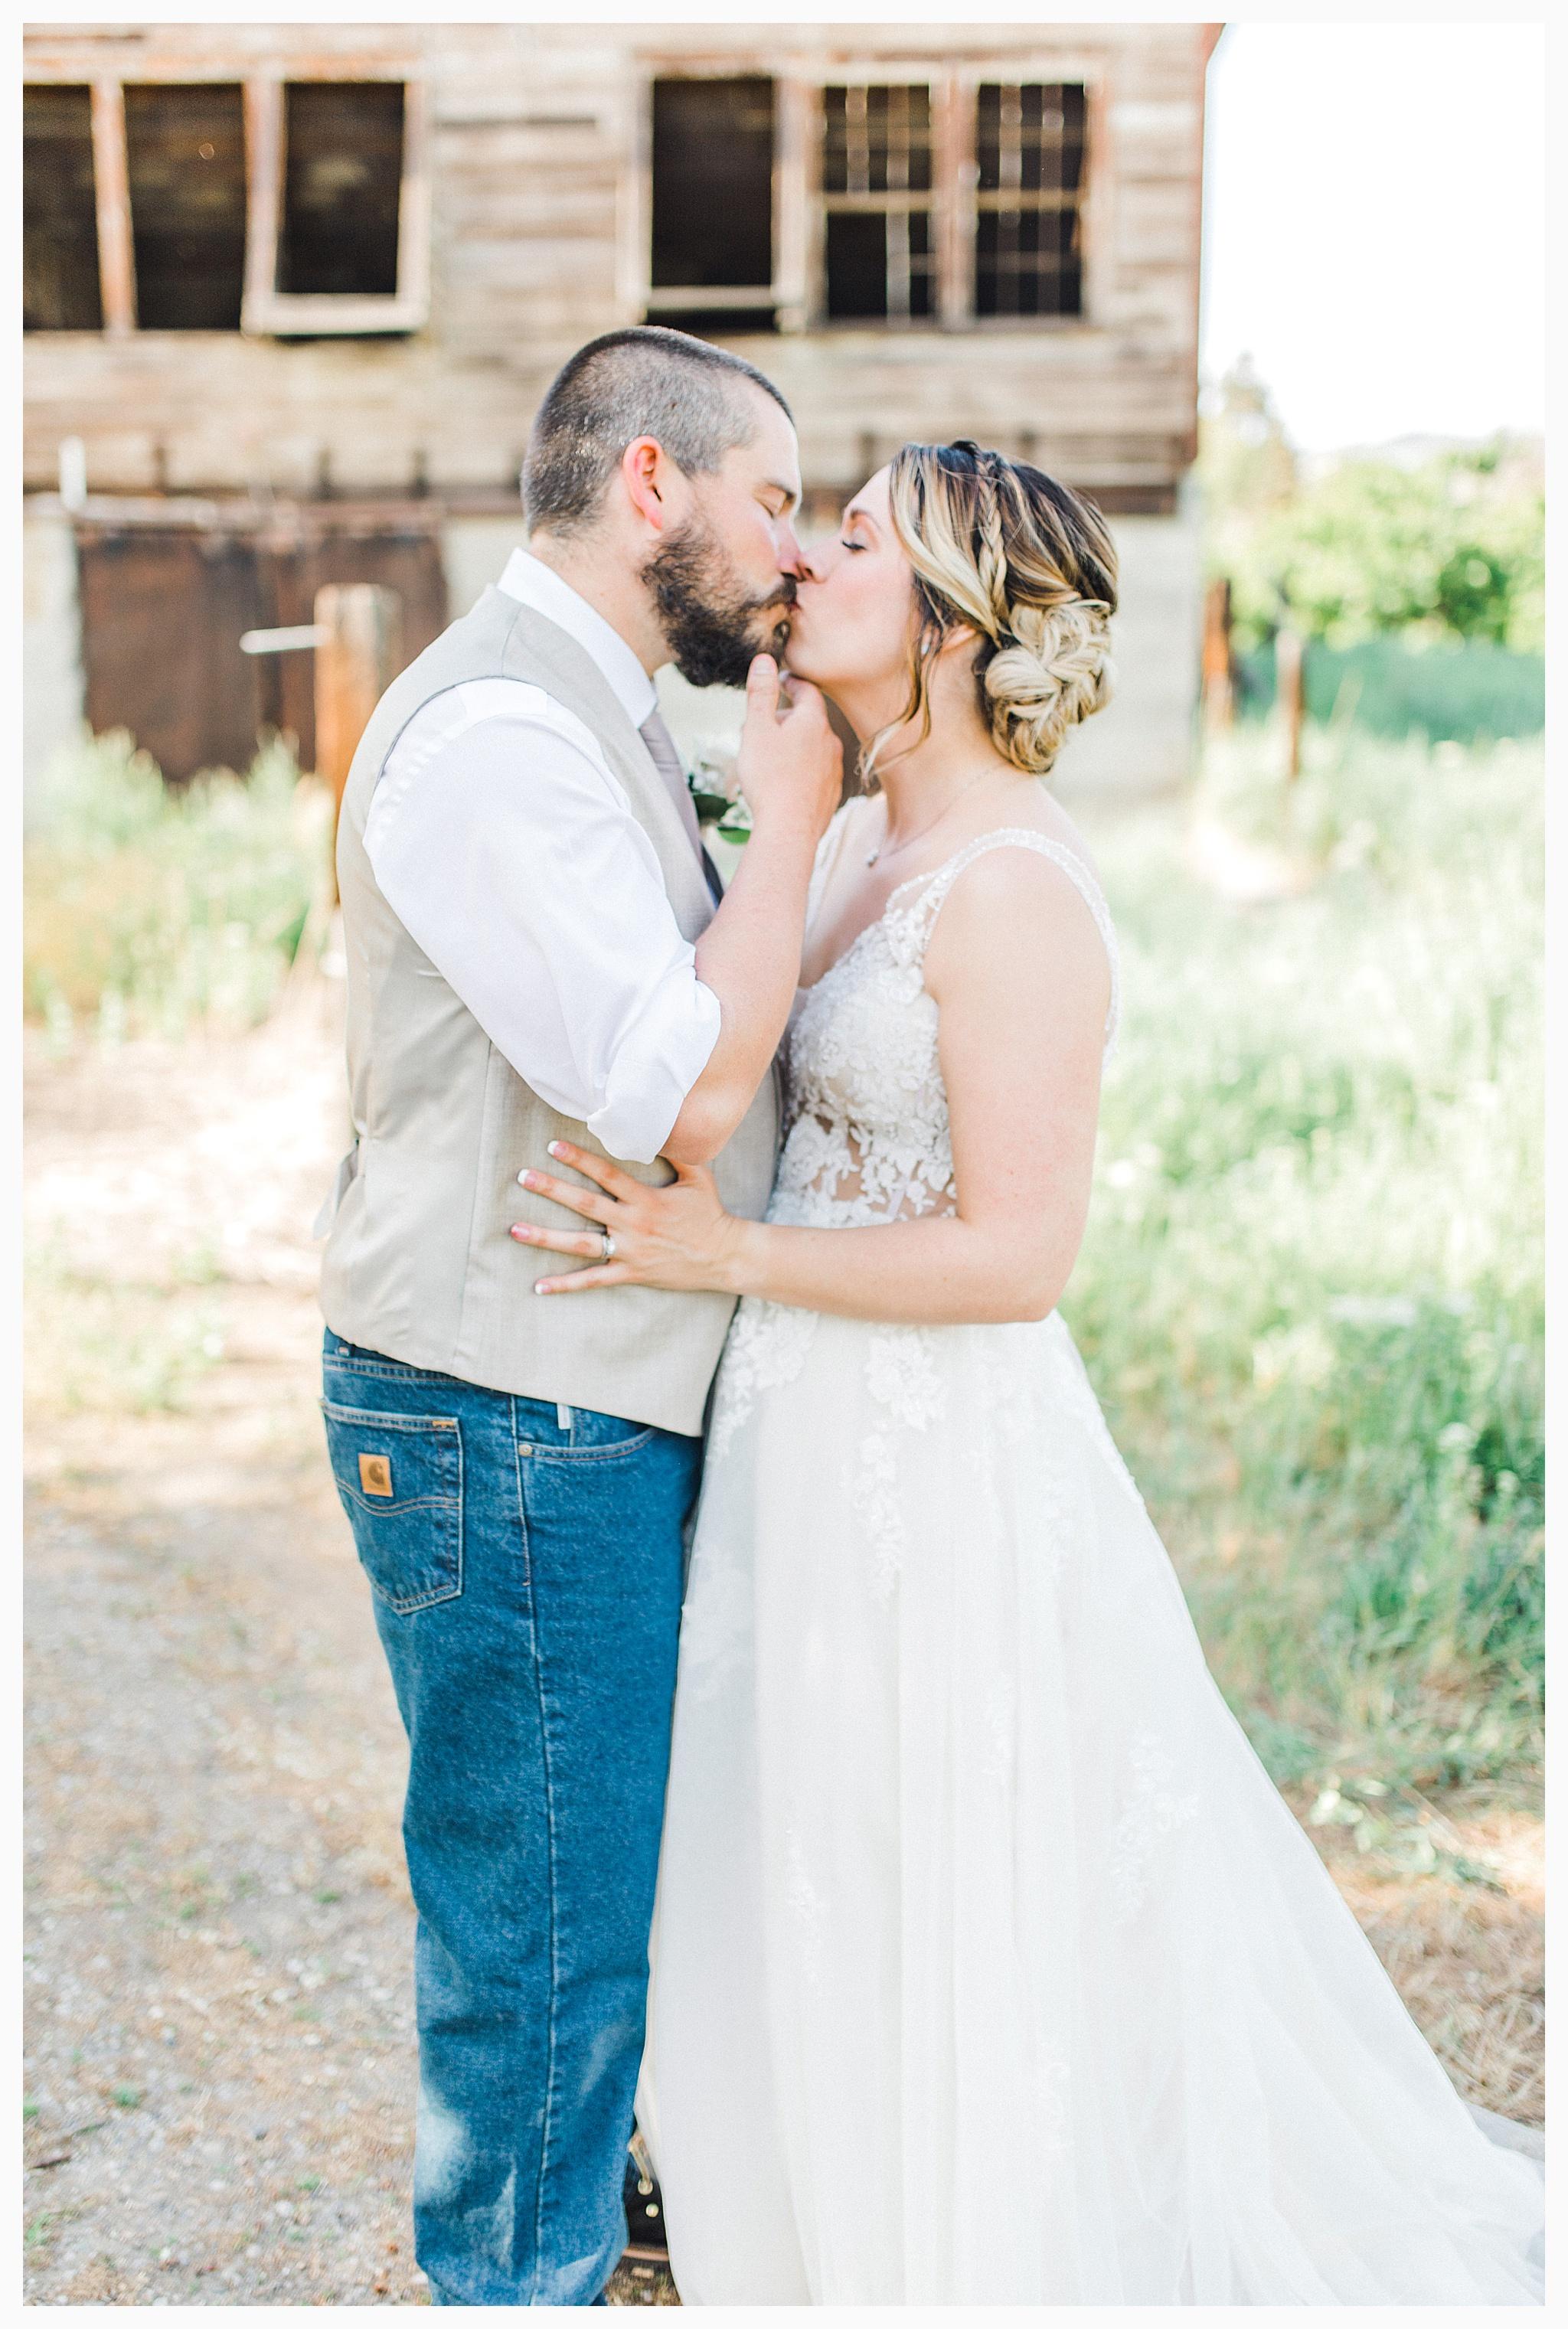 Rustic barn wedding in Wenatchee Washington at Sunshine Ranch on Easy Street, Emma Rose Company Seattle PNW Light and Airy Wedding Photographer_0087.jpg